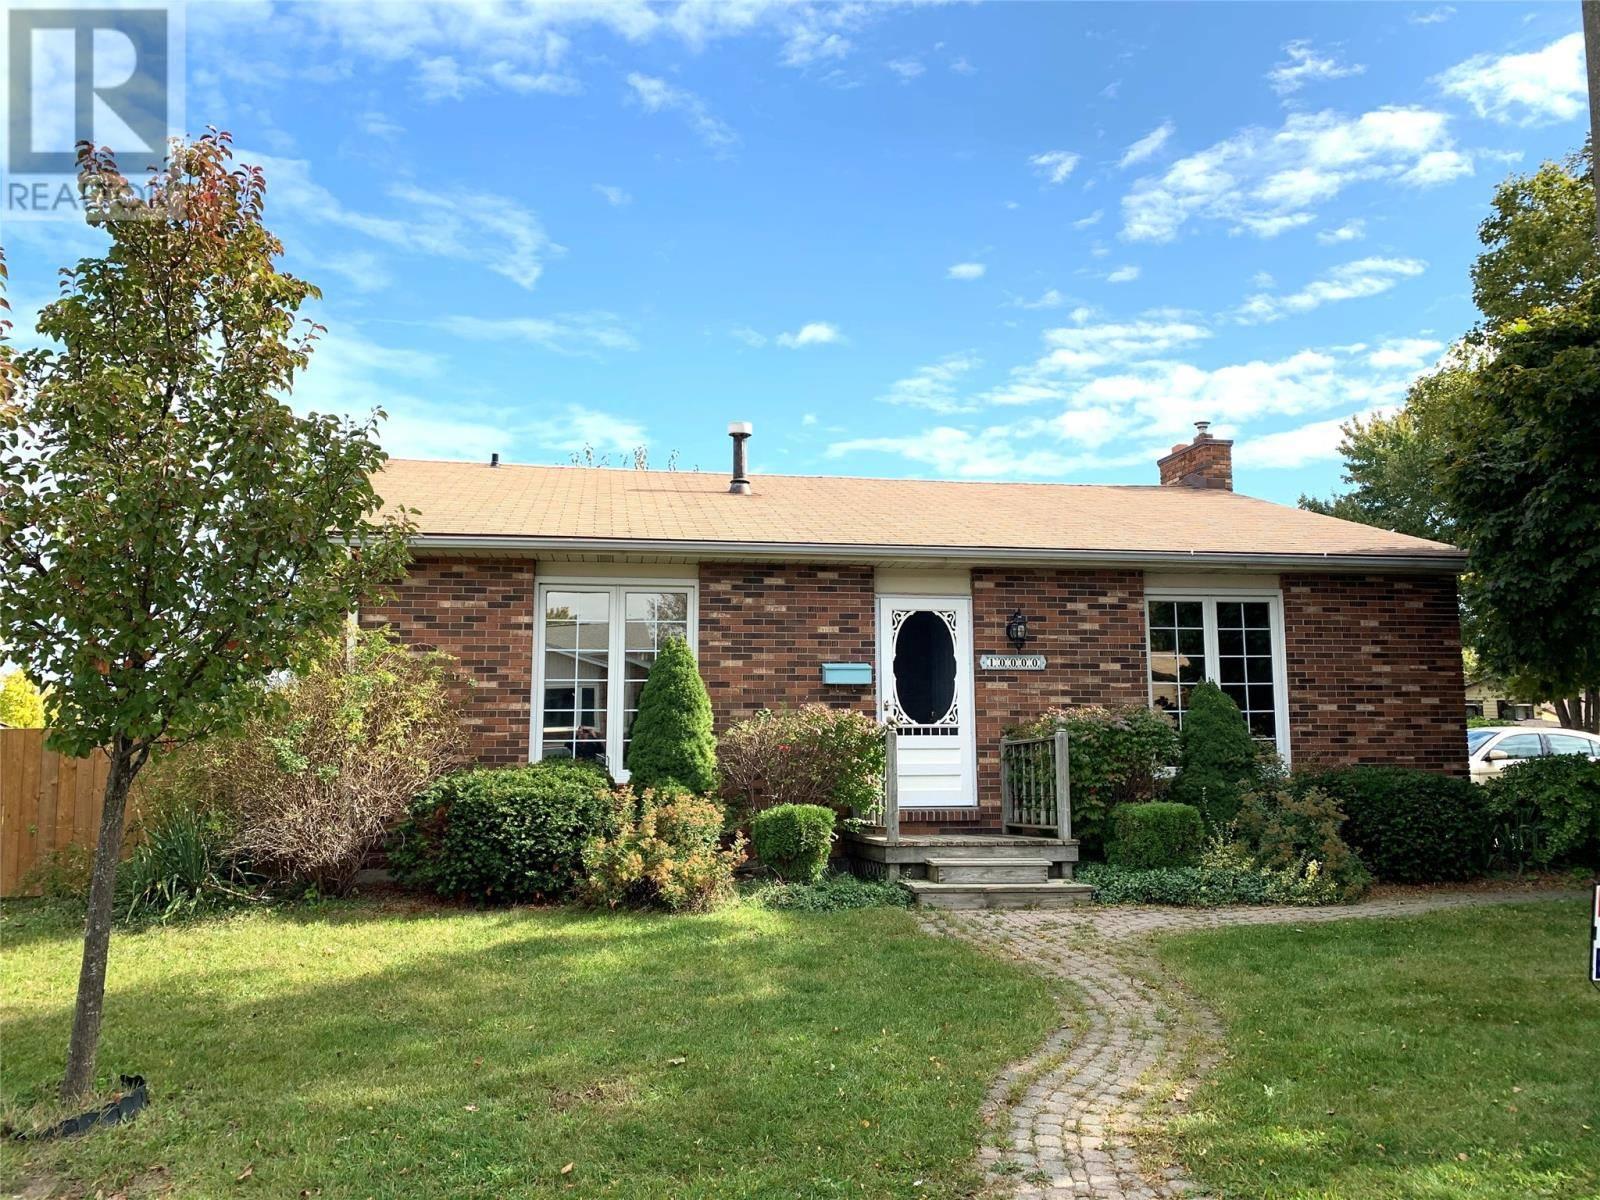 House for sale at 10000 Aspen Ln Windsor Ontario - MLS: 19027311